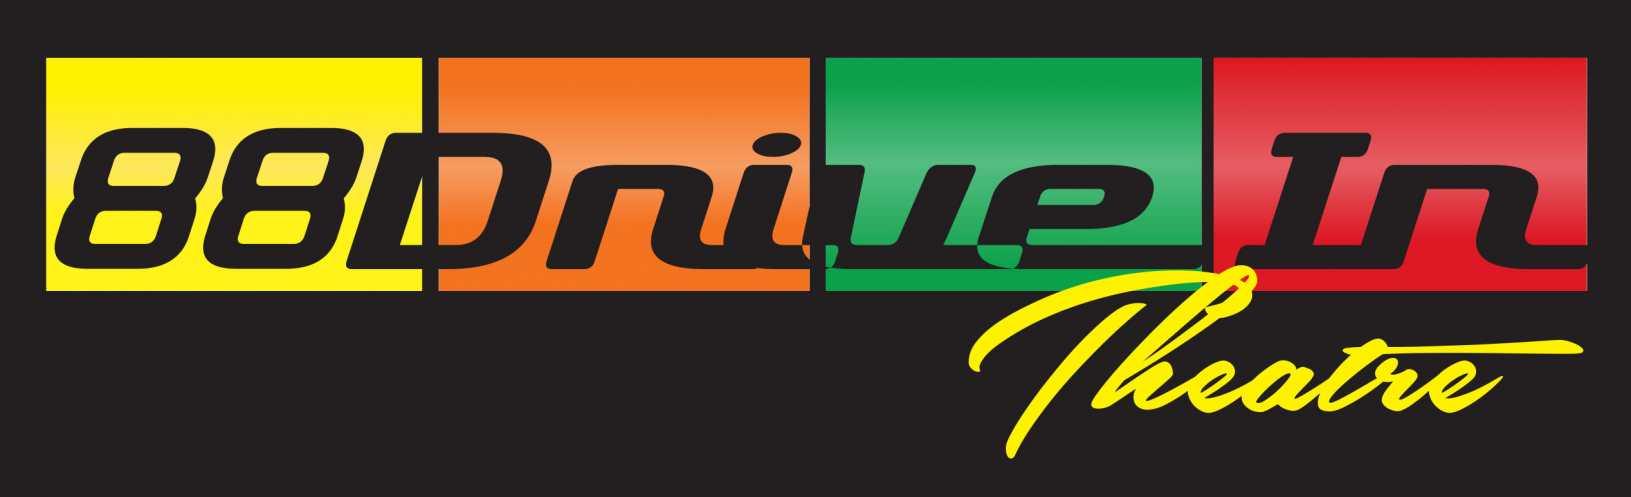 88DriveIn Logo